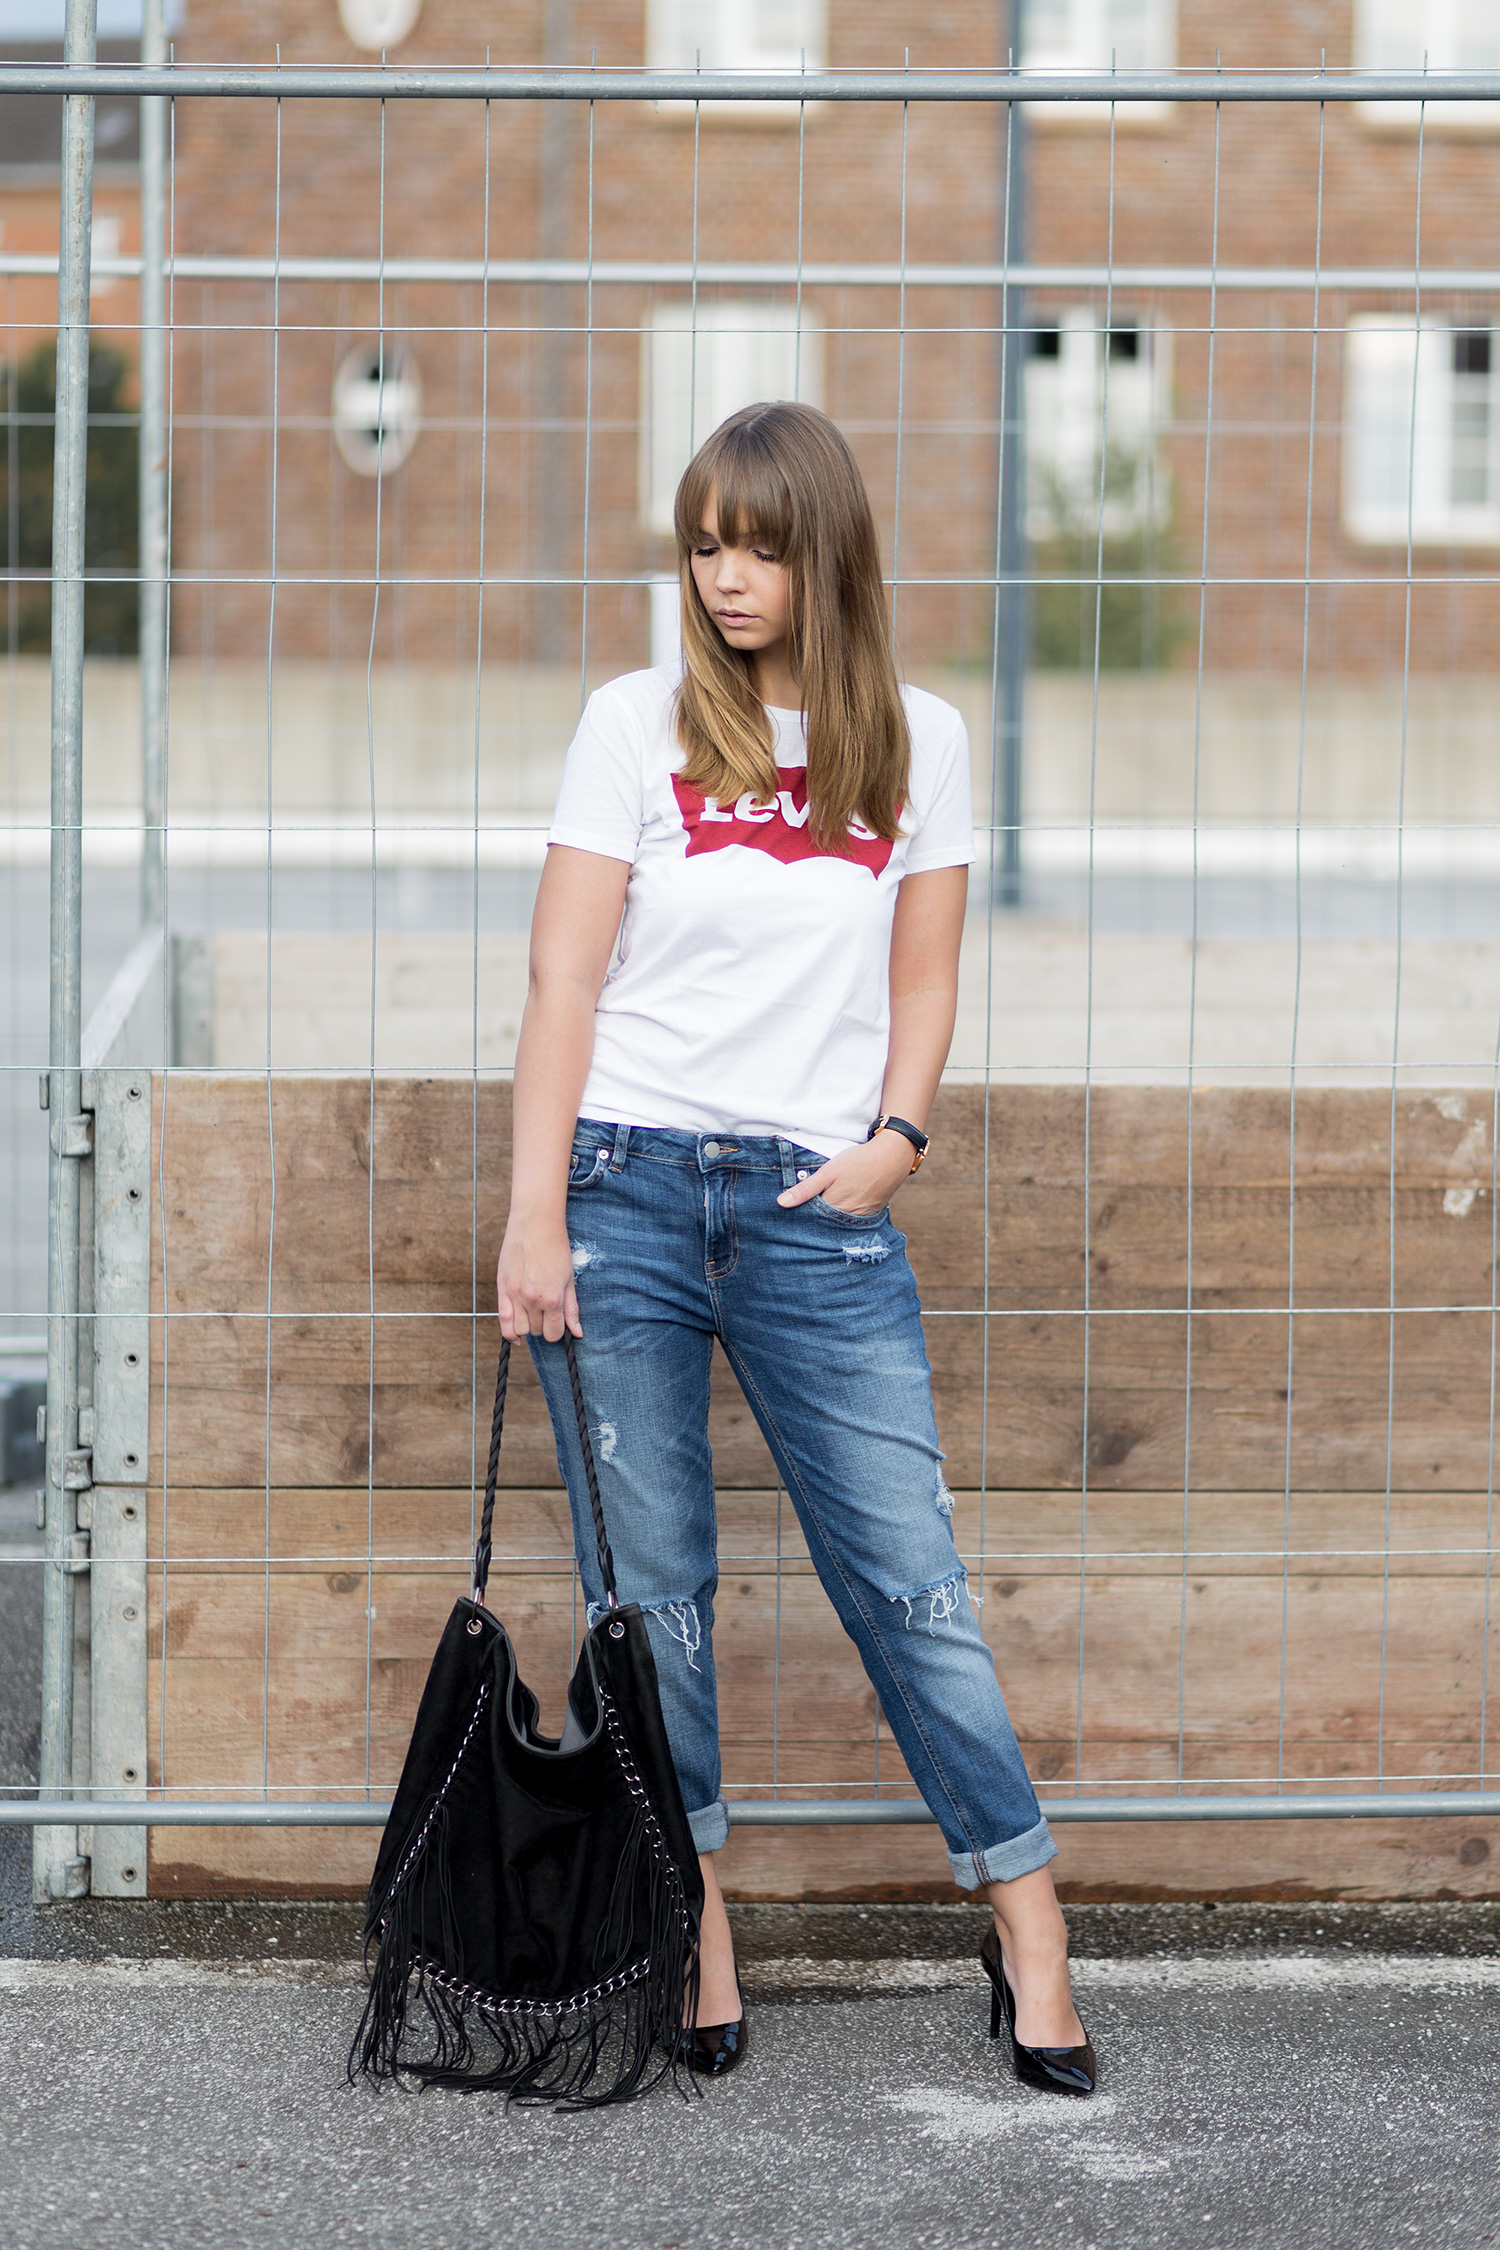 Schwarze Pumps kombinieren, Outfit mit Levi's Shirt und Girlfriend Jeans, bezauberndenana.de